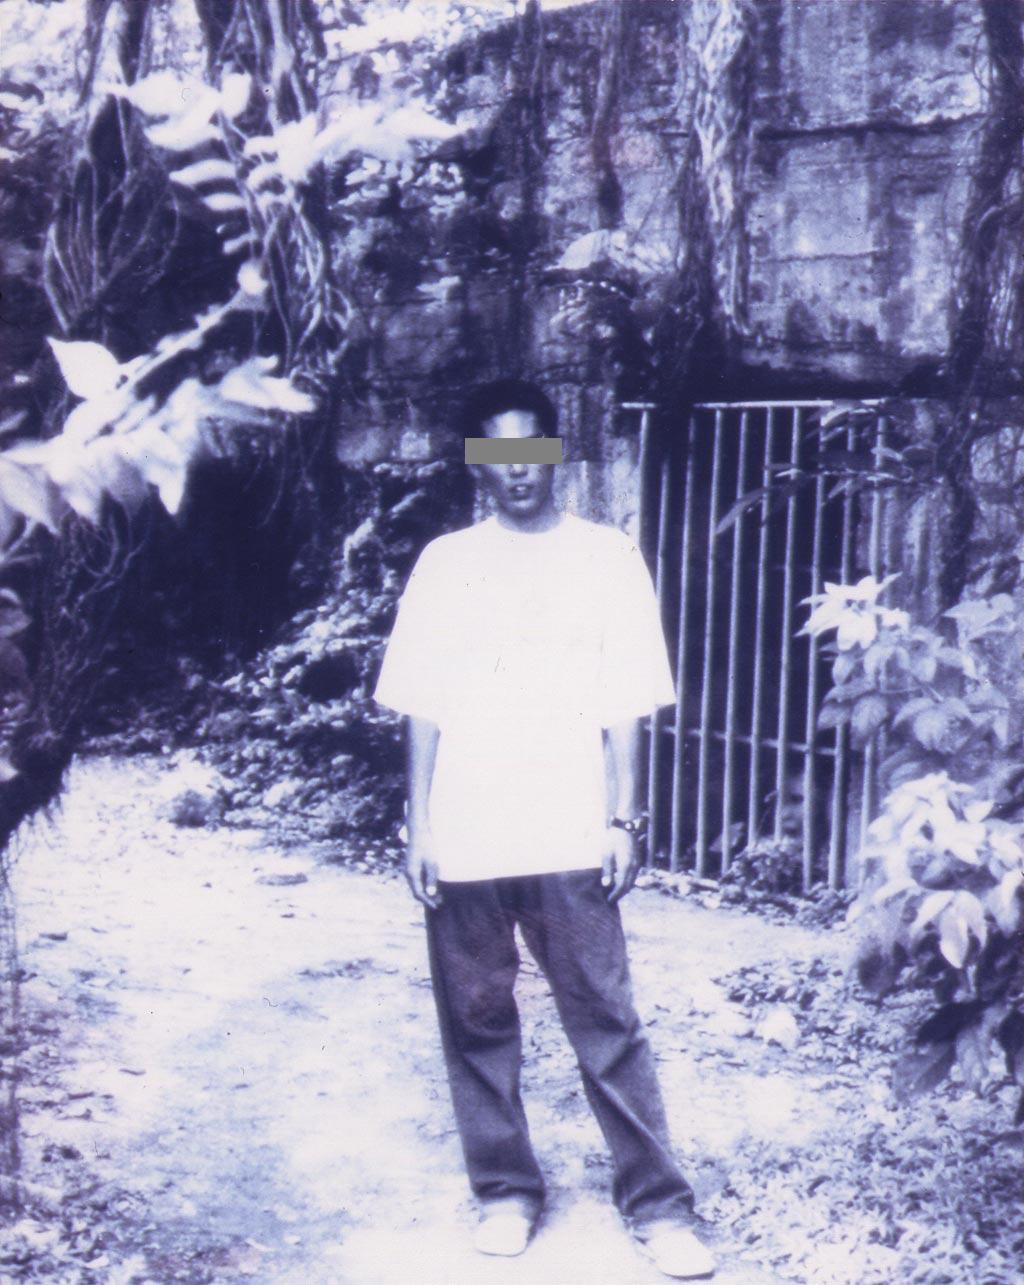 Tainted Corrosive Mist / RDC - Split Part 1